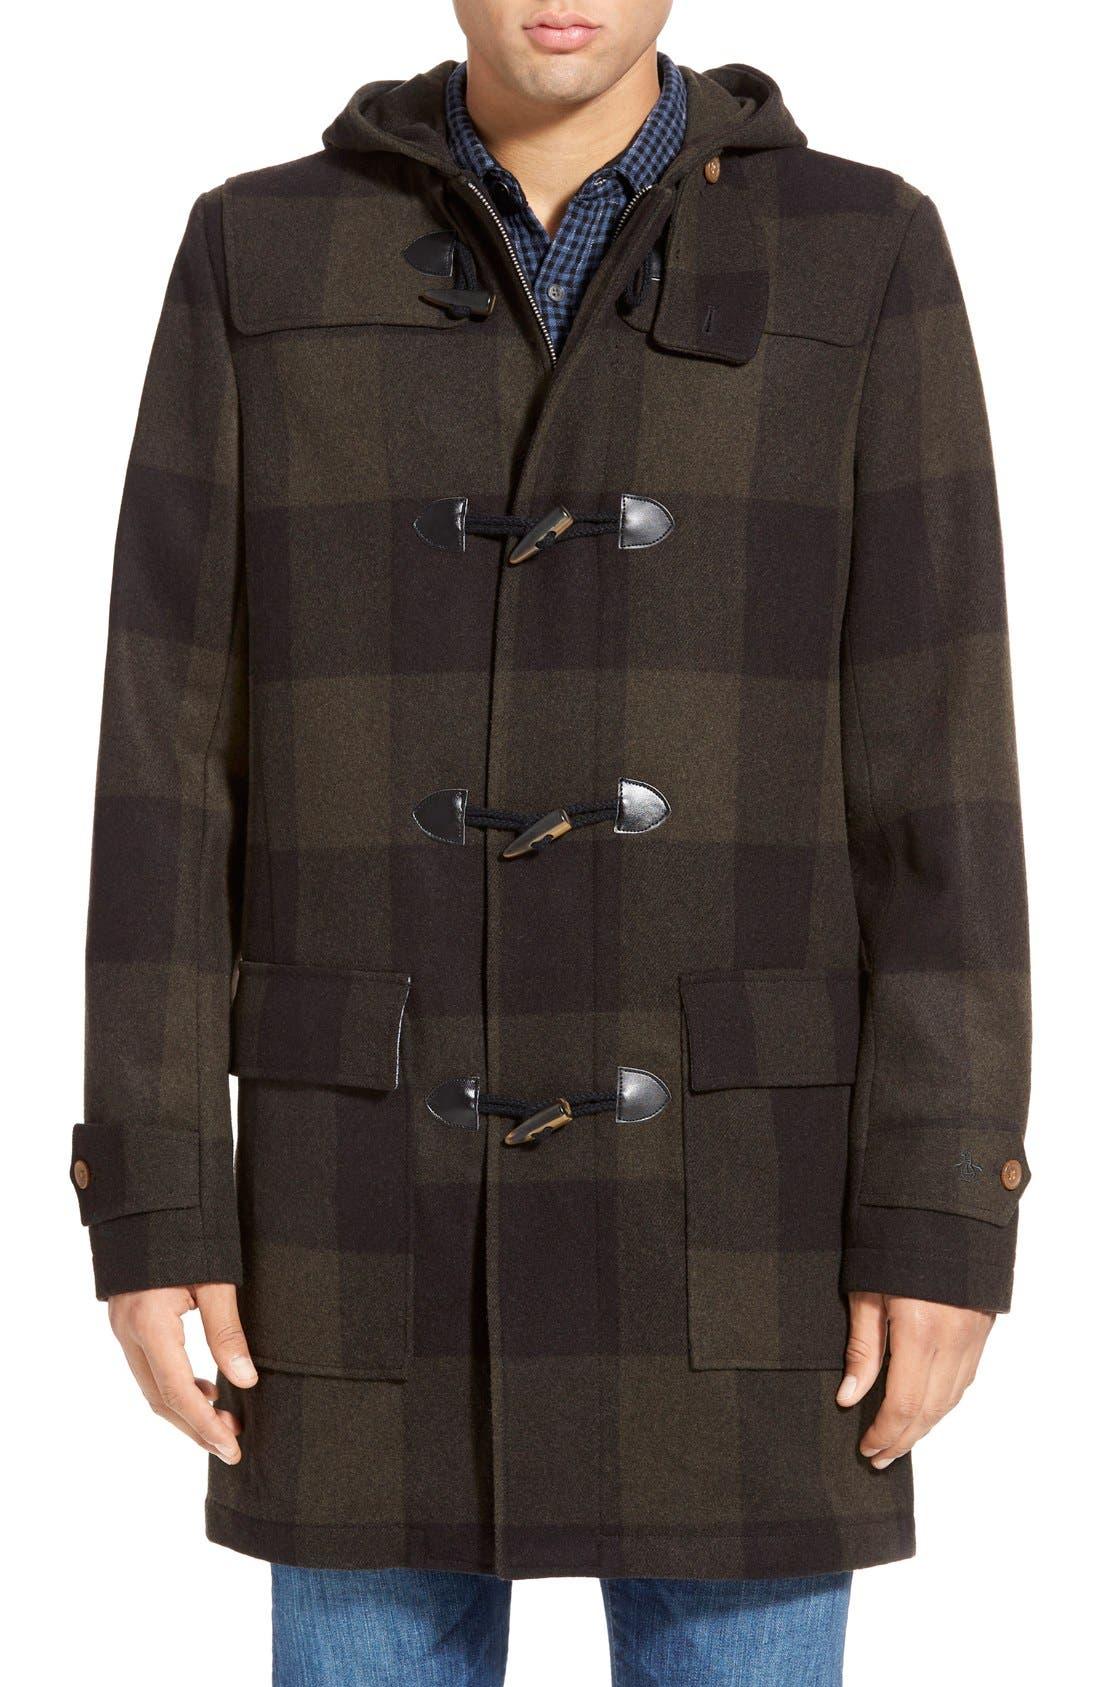 ORIGINAL PENGUIN 'Paddington' Wool Blend Duffle Coat, Main, color, 019